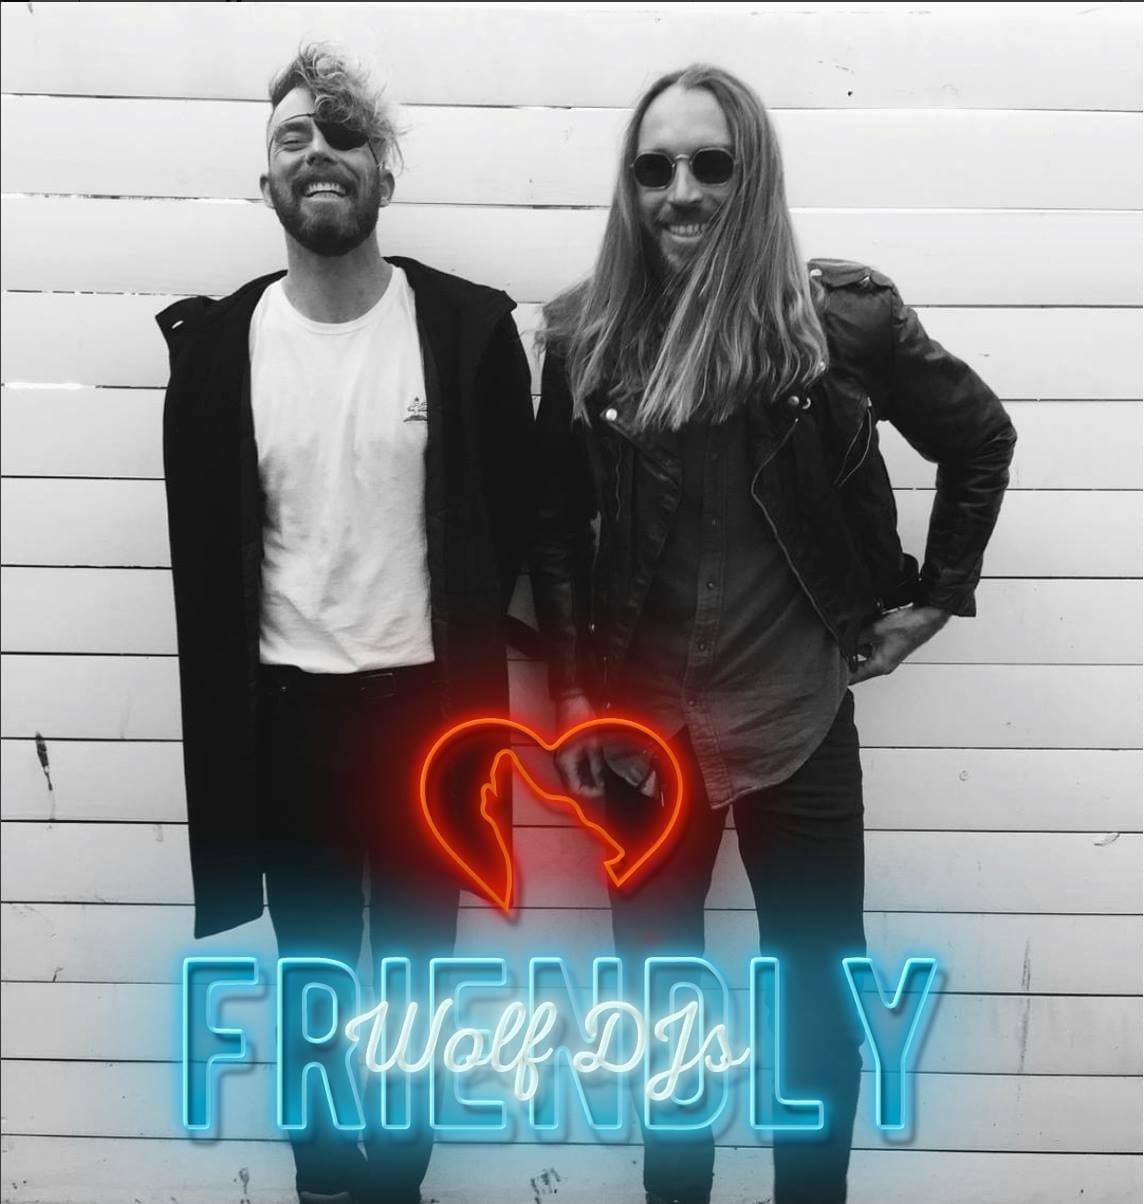 image1 (1) [object object] - image1 1 - Friday Night Live – Friendly Wolf DJs